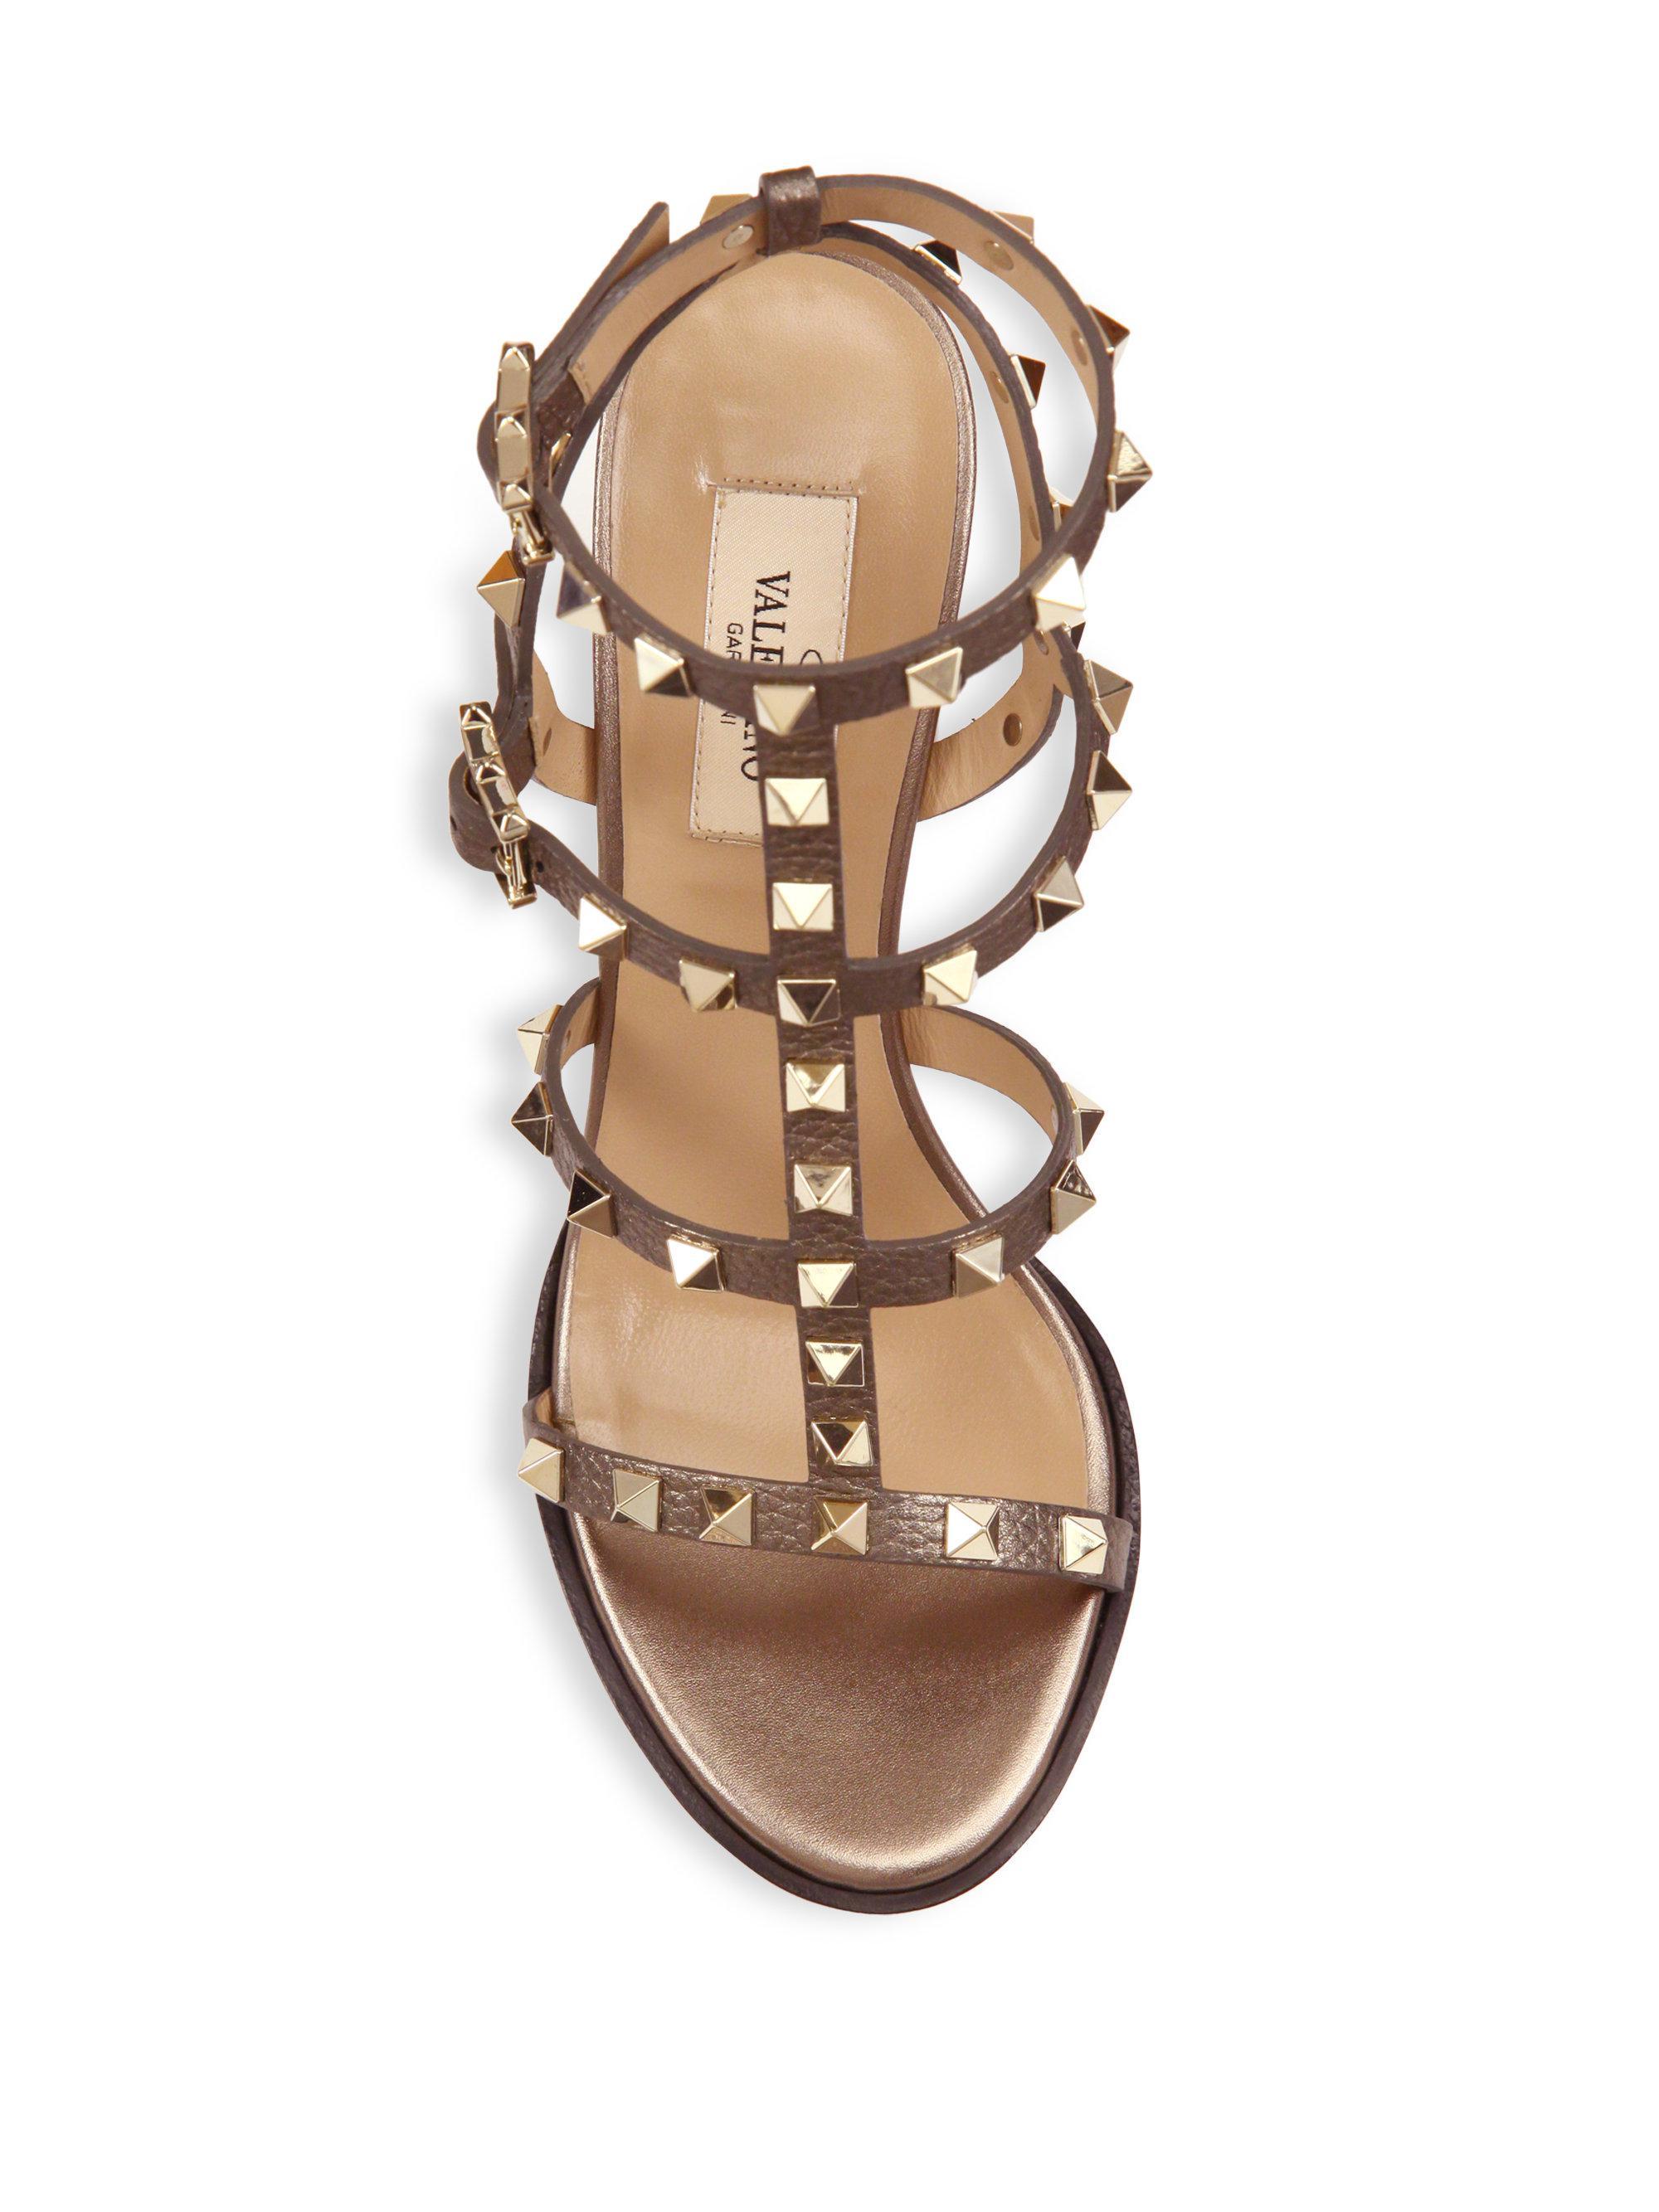 9e44bc77f29 Valentino Rockstud Metallic Leather Cage Block Heel Sandals in ...